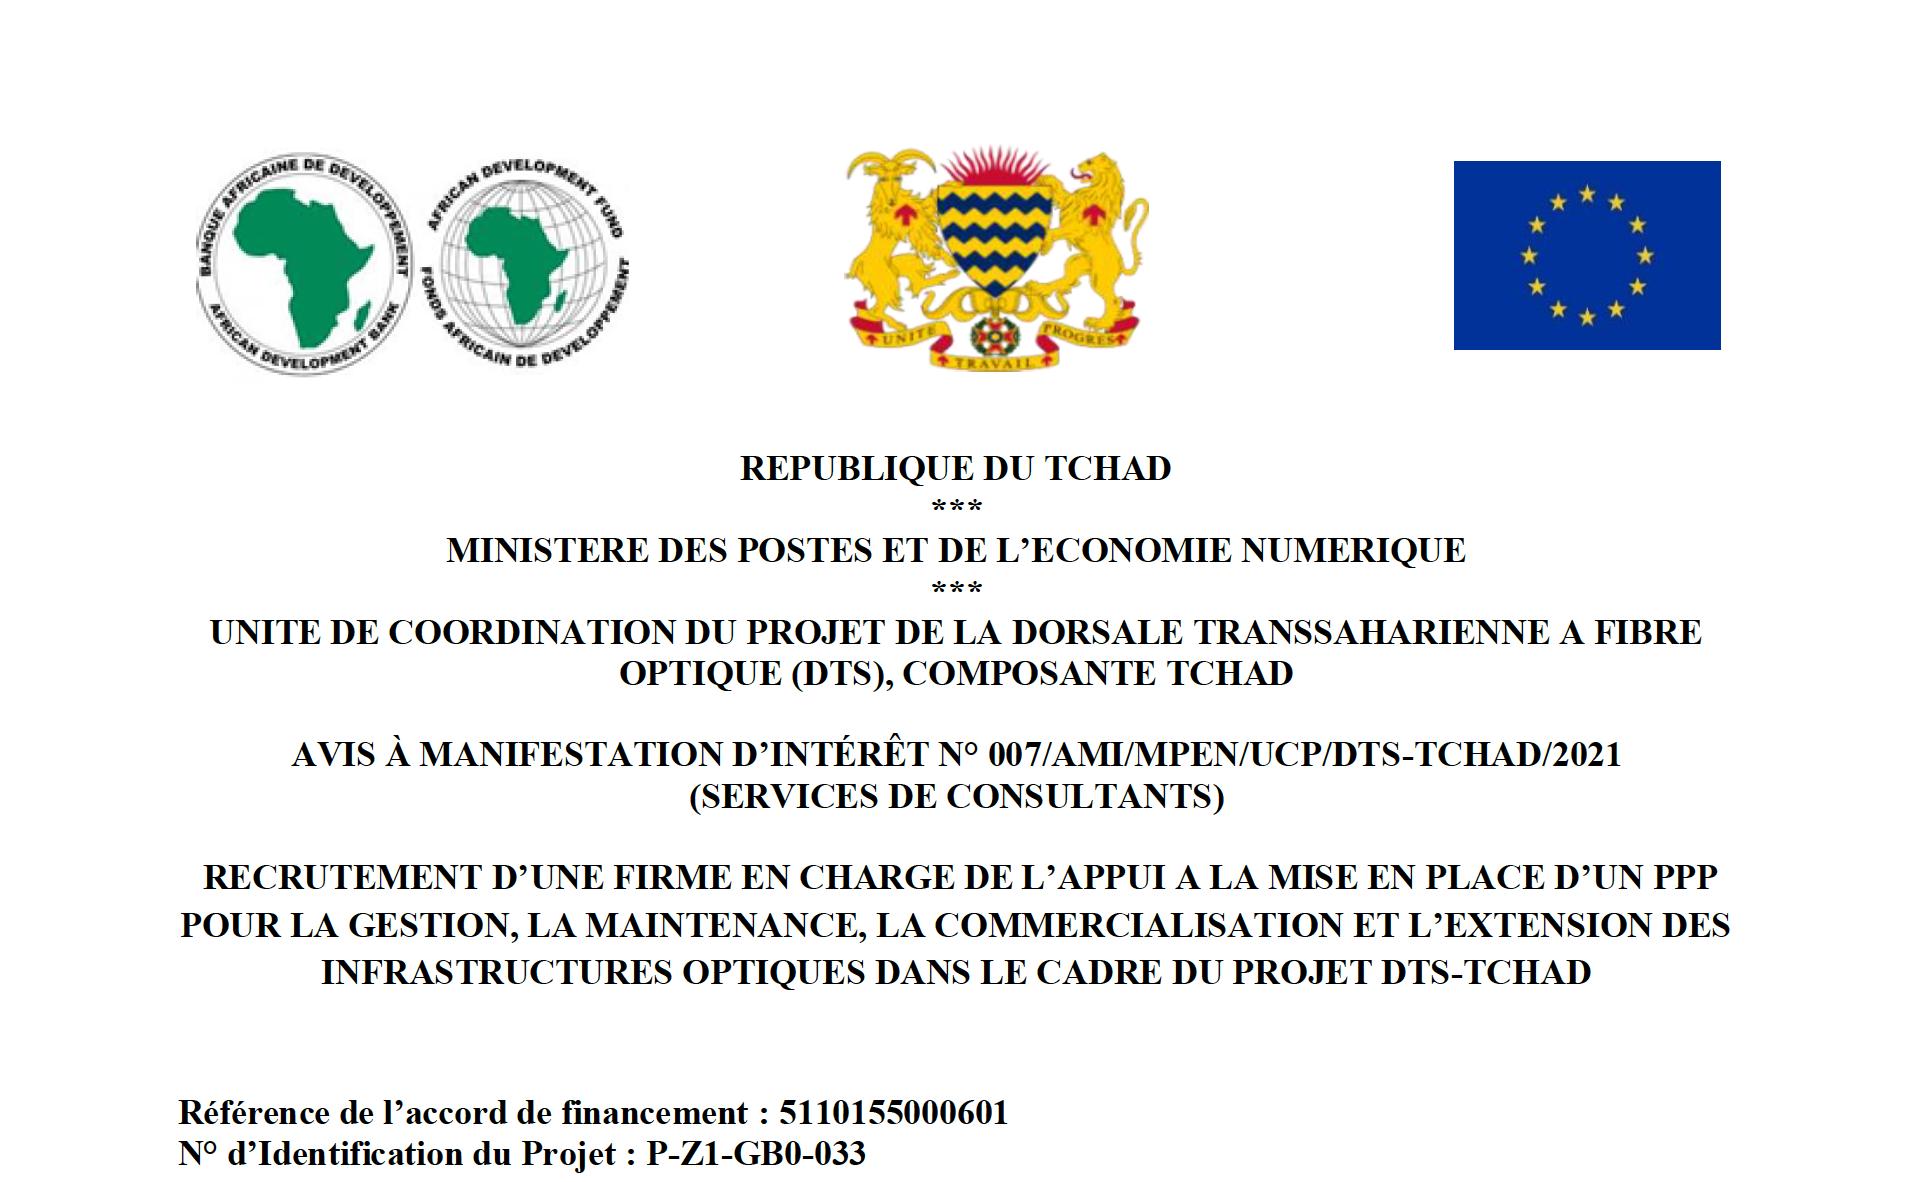 Projet DTS-Tchad